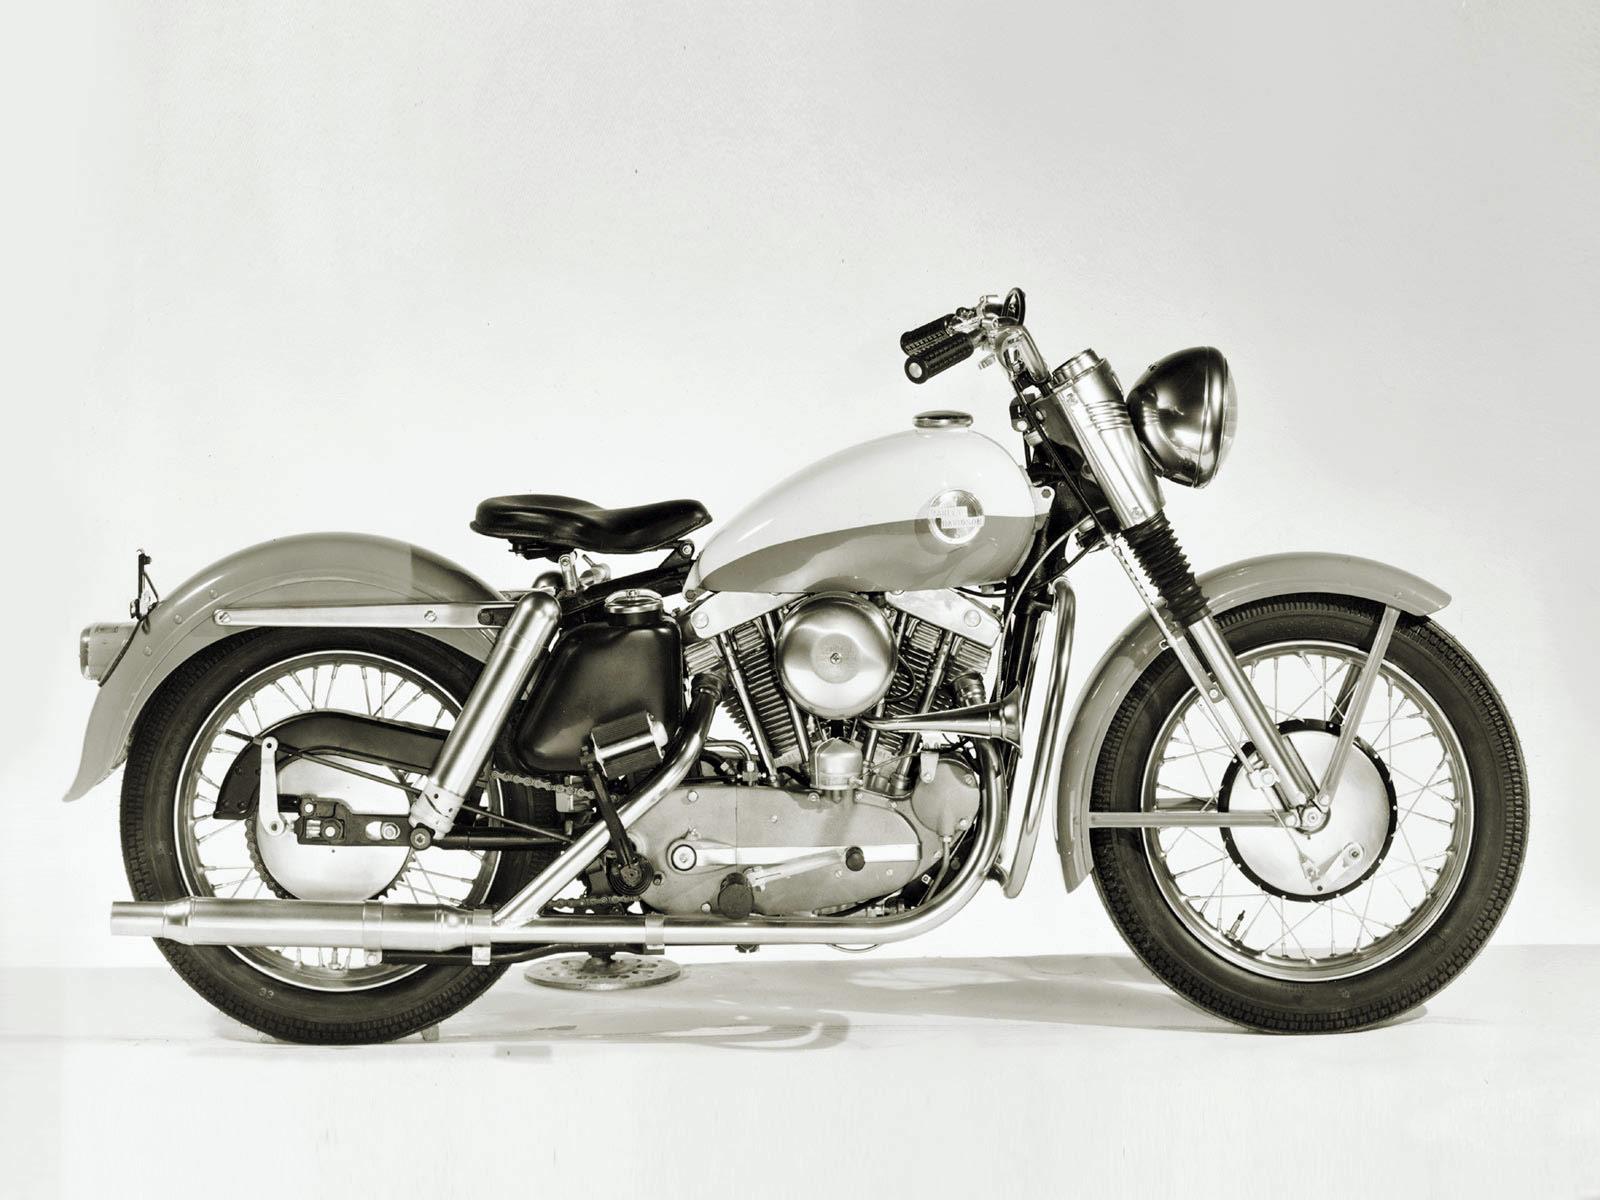 Harley Davidson: 1957 Harley-Davidson XL Sportster Pictures. Accident